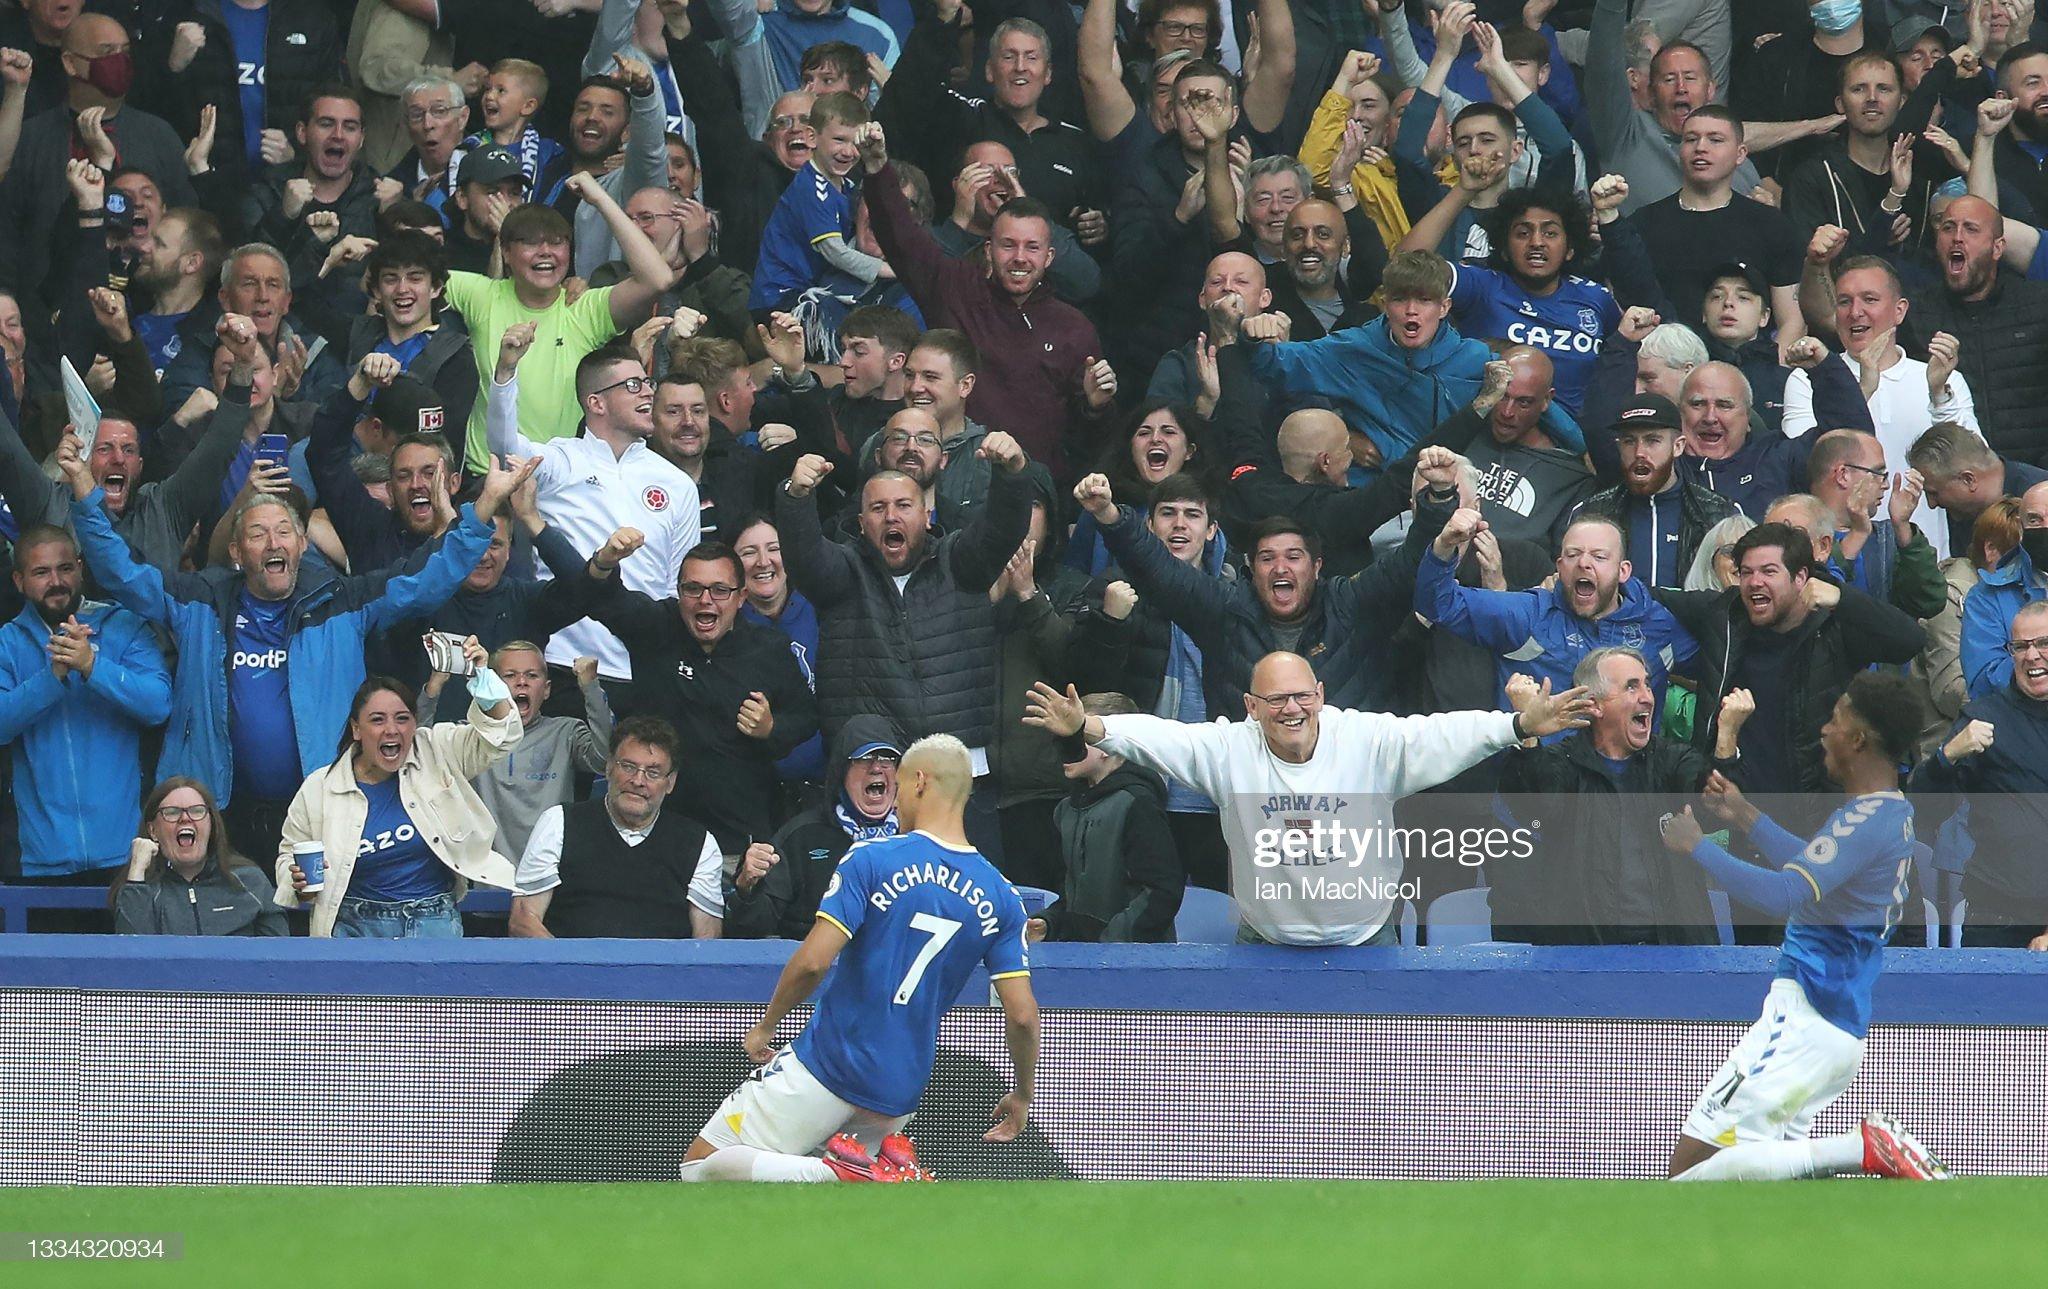 An emotional weekend as fans return to Premier League stadiums